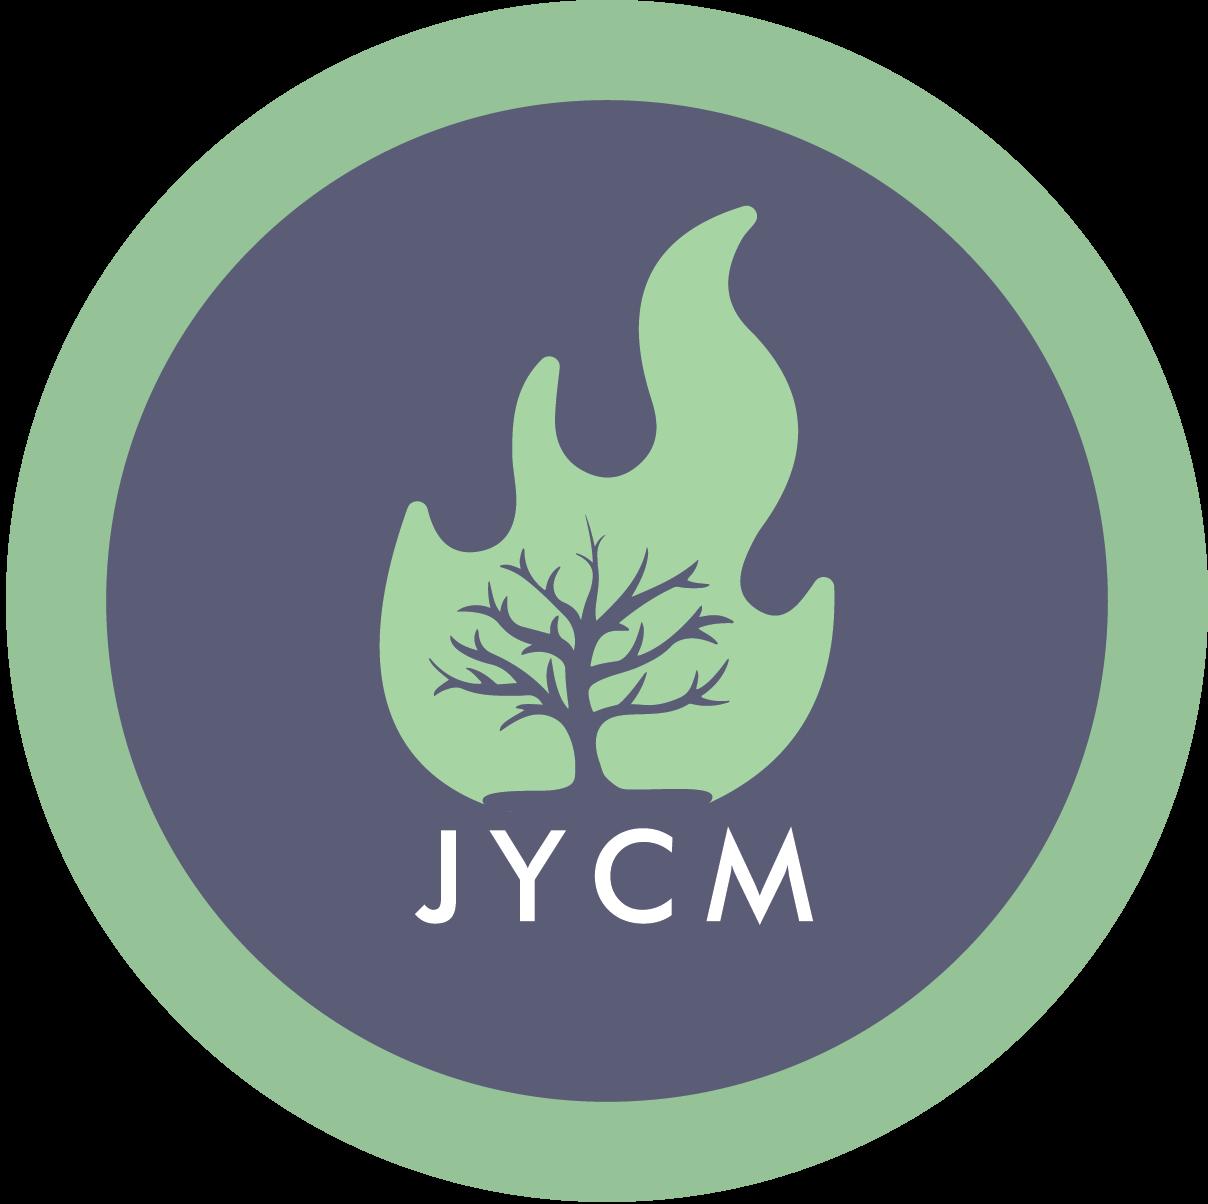 Jewish Youth Climate Movement